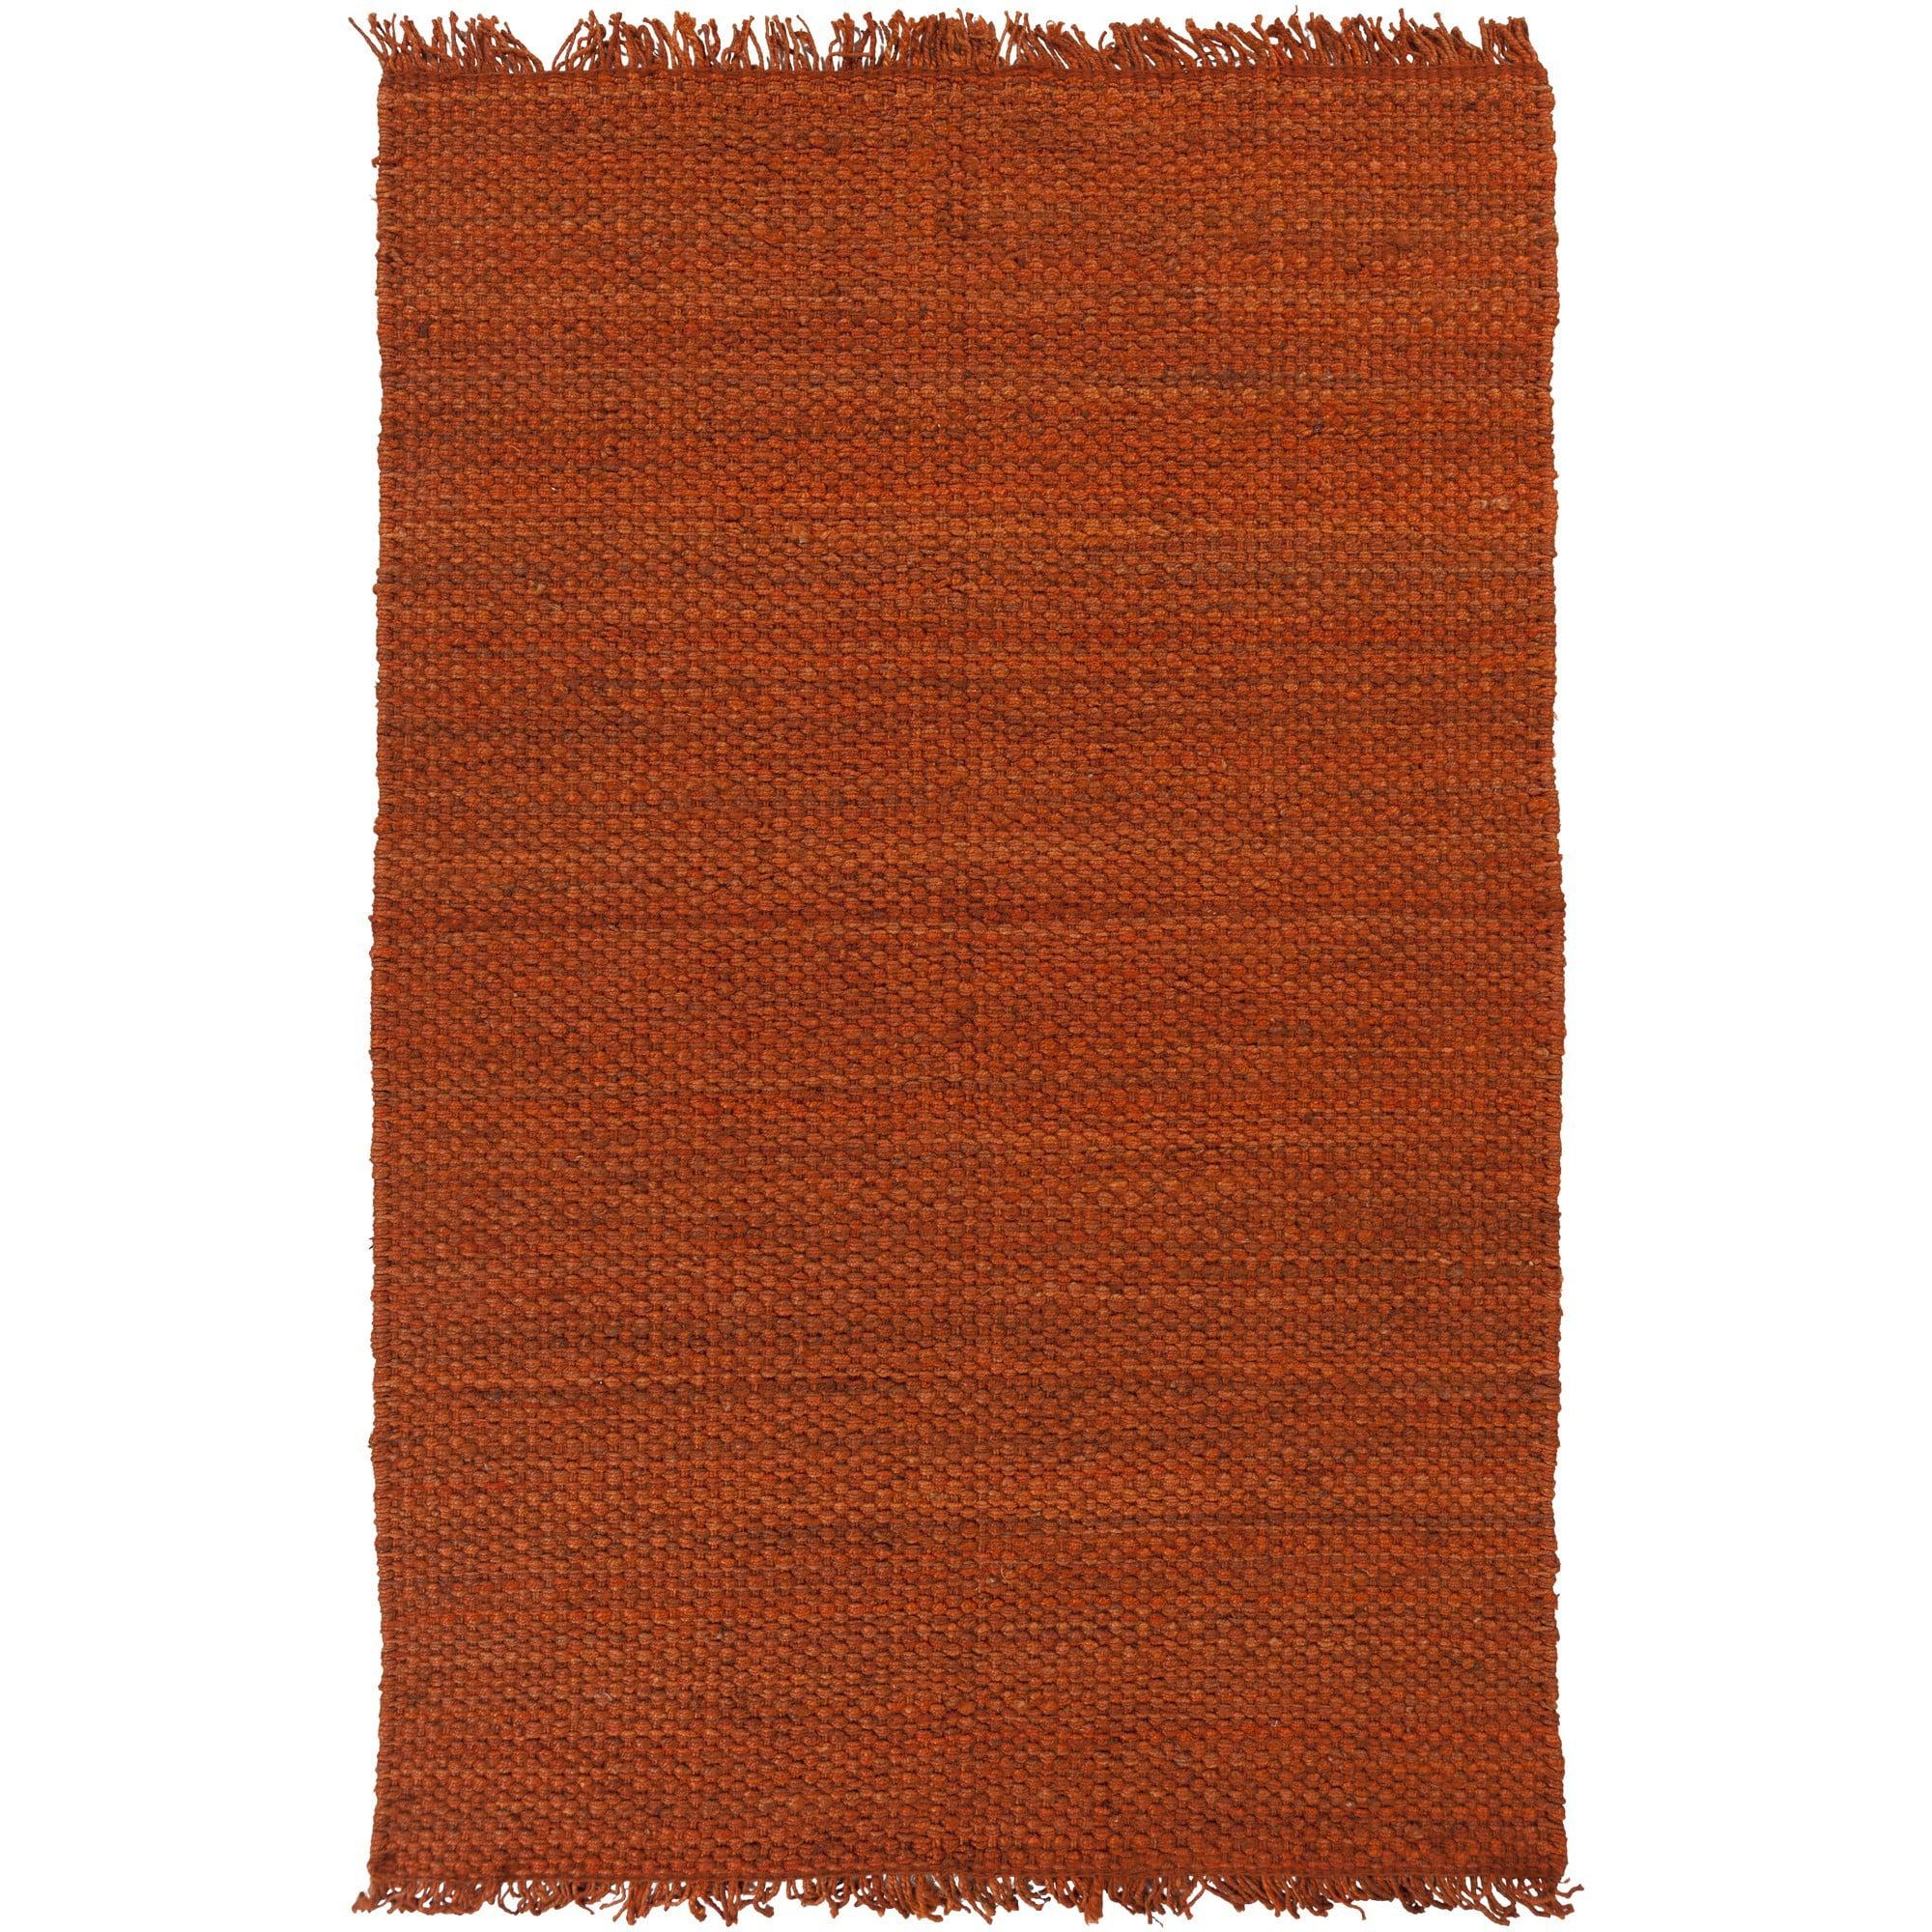 "Artistic Weavers Tropica Harper 2'3"" x 8' Rectangular Area Rug"